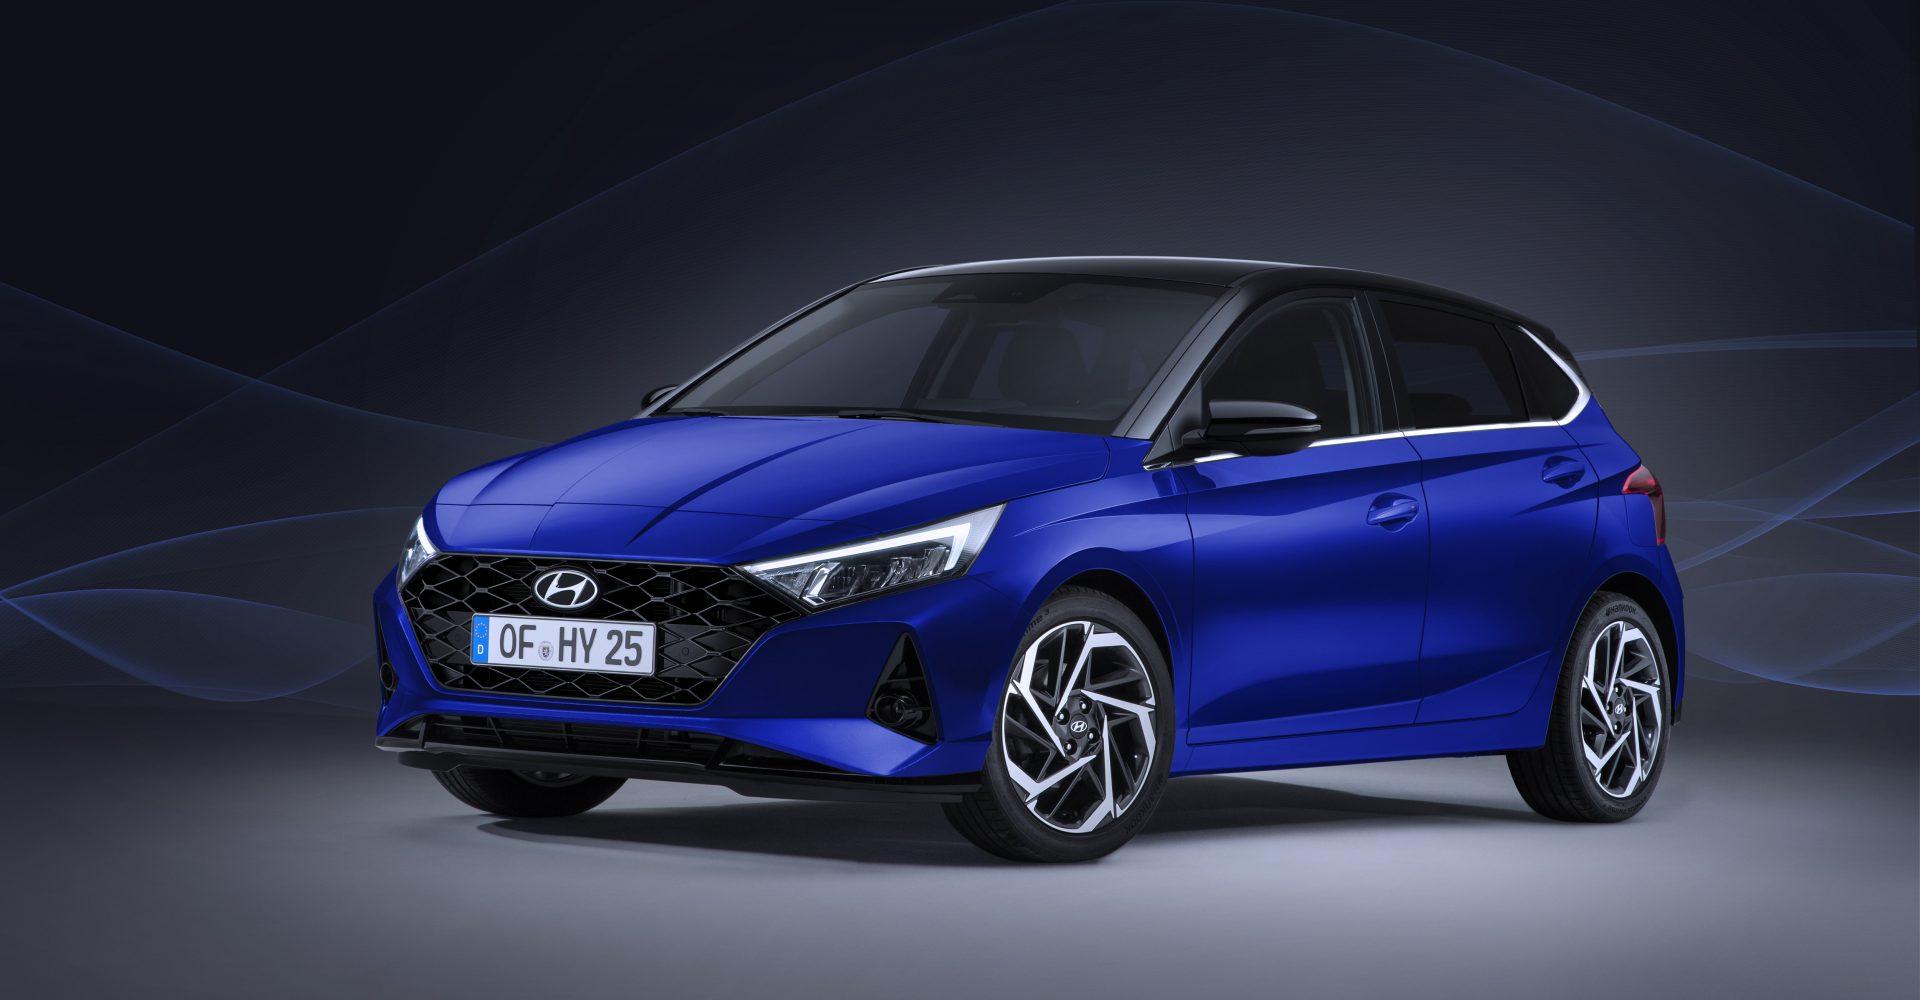 All-new Hyundai i20 breaks cover